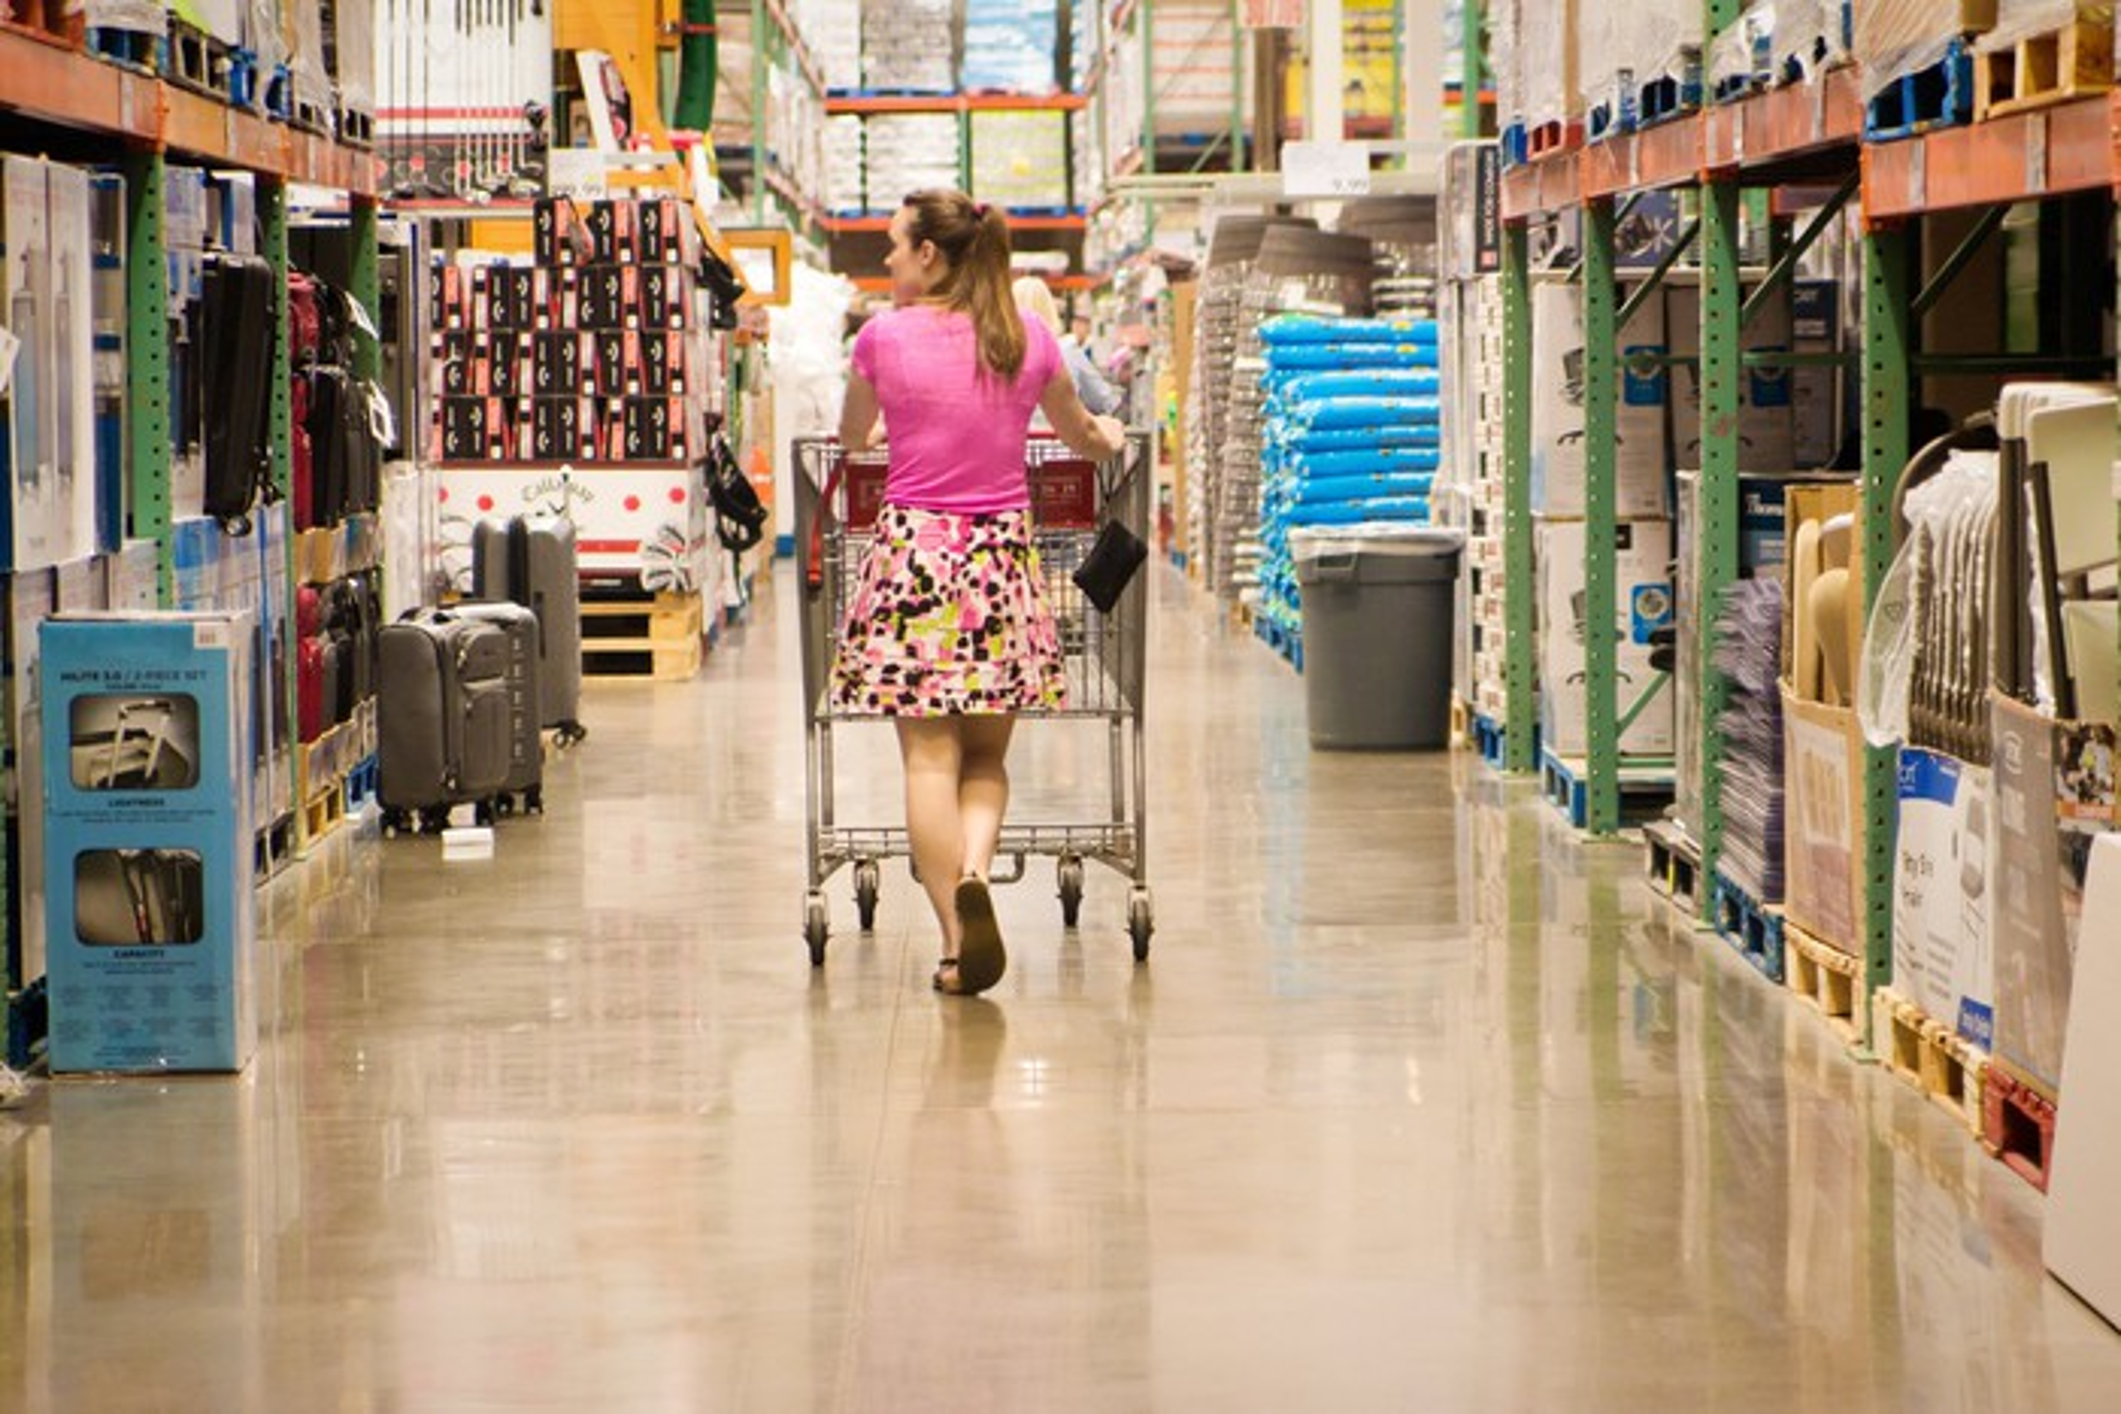 A customer walks down the warehouse aisle.